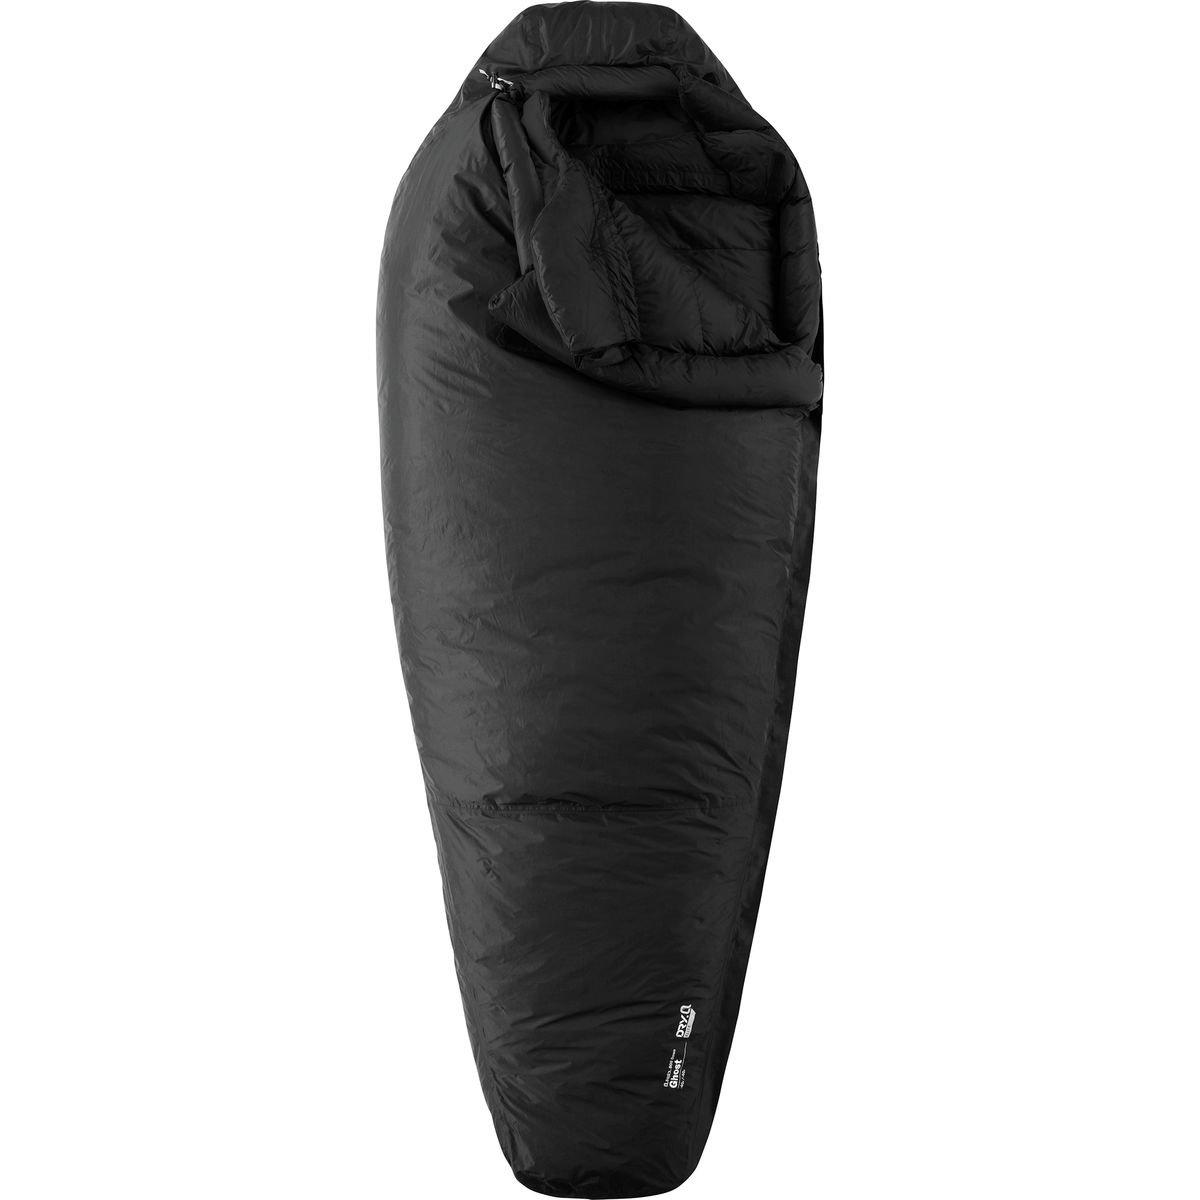 Mountain Hardwear Ghost Regular - Black / Black - 198 cm RV links - Wasserdichter insulated Daunen Expeditions-Schlafsack